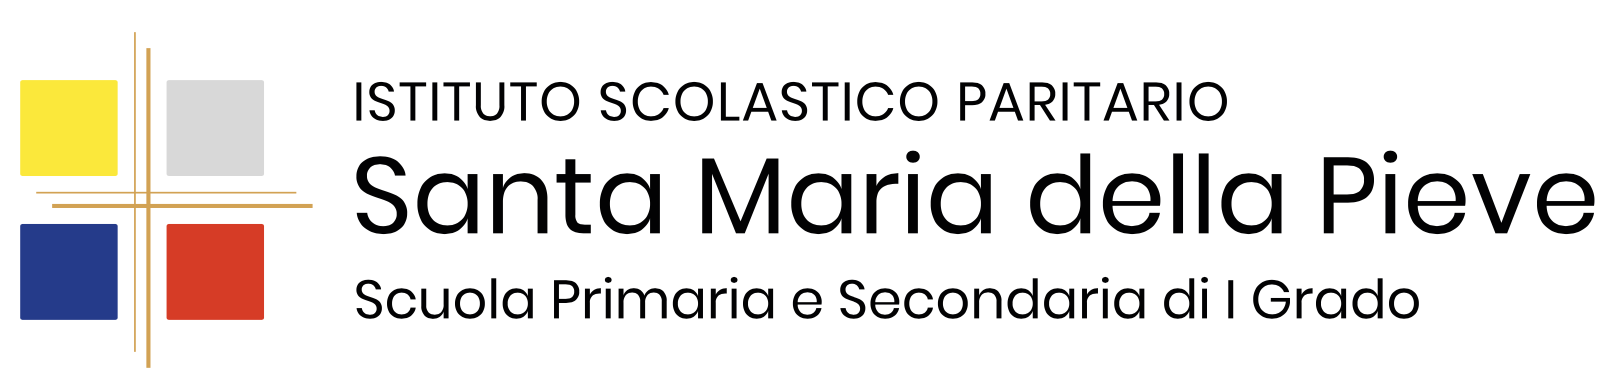 "Istituto Scolastico Paritario ""Santa Maria della Pieve"""